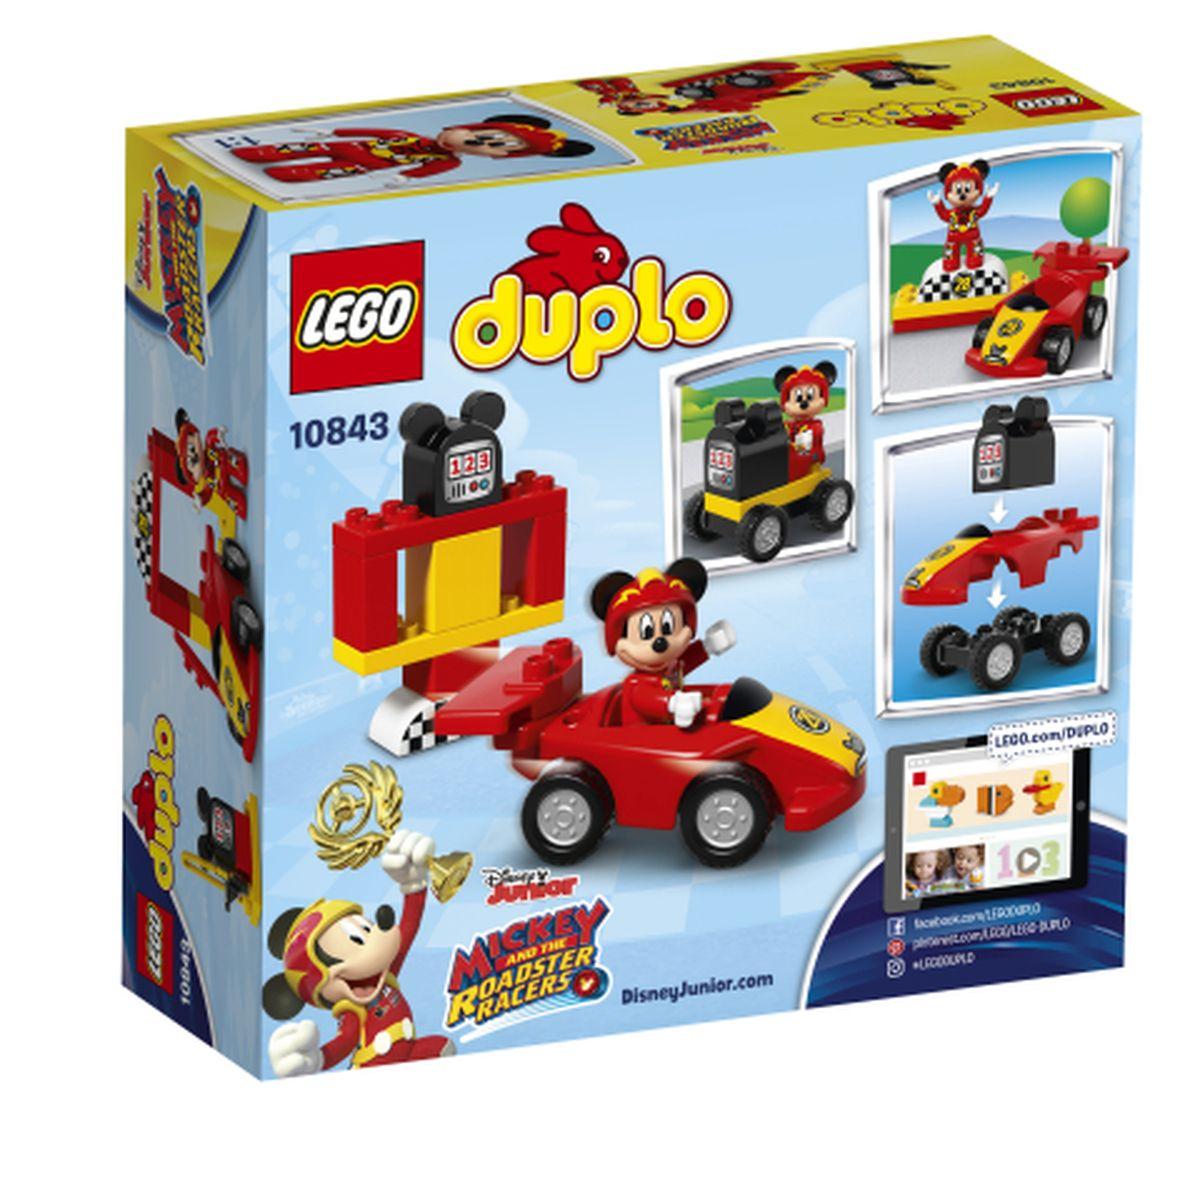 La Voiture 10843 Course Mickey Lego® Mouse De Duplo® P8nwkX0O